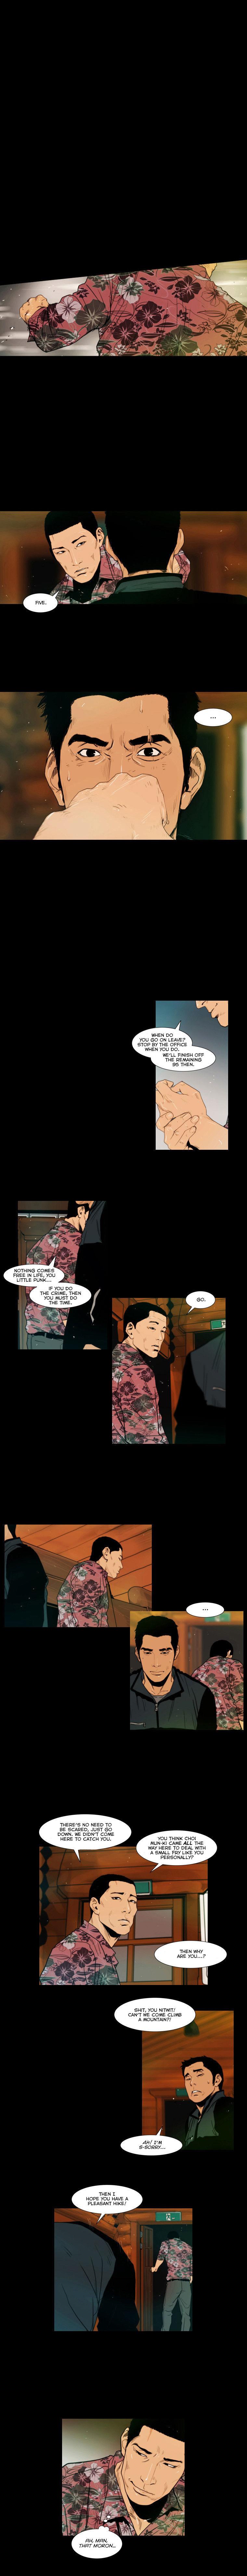 Peak (Im Gang-hyeok) 74 Page 2